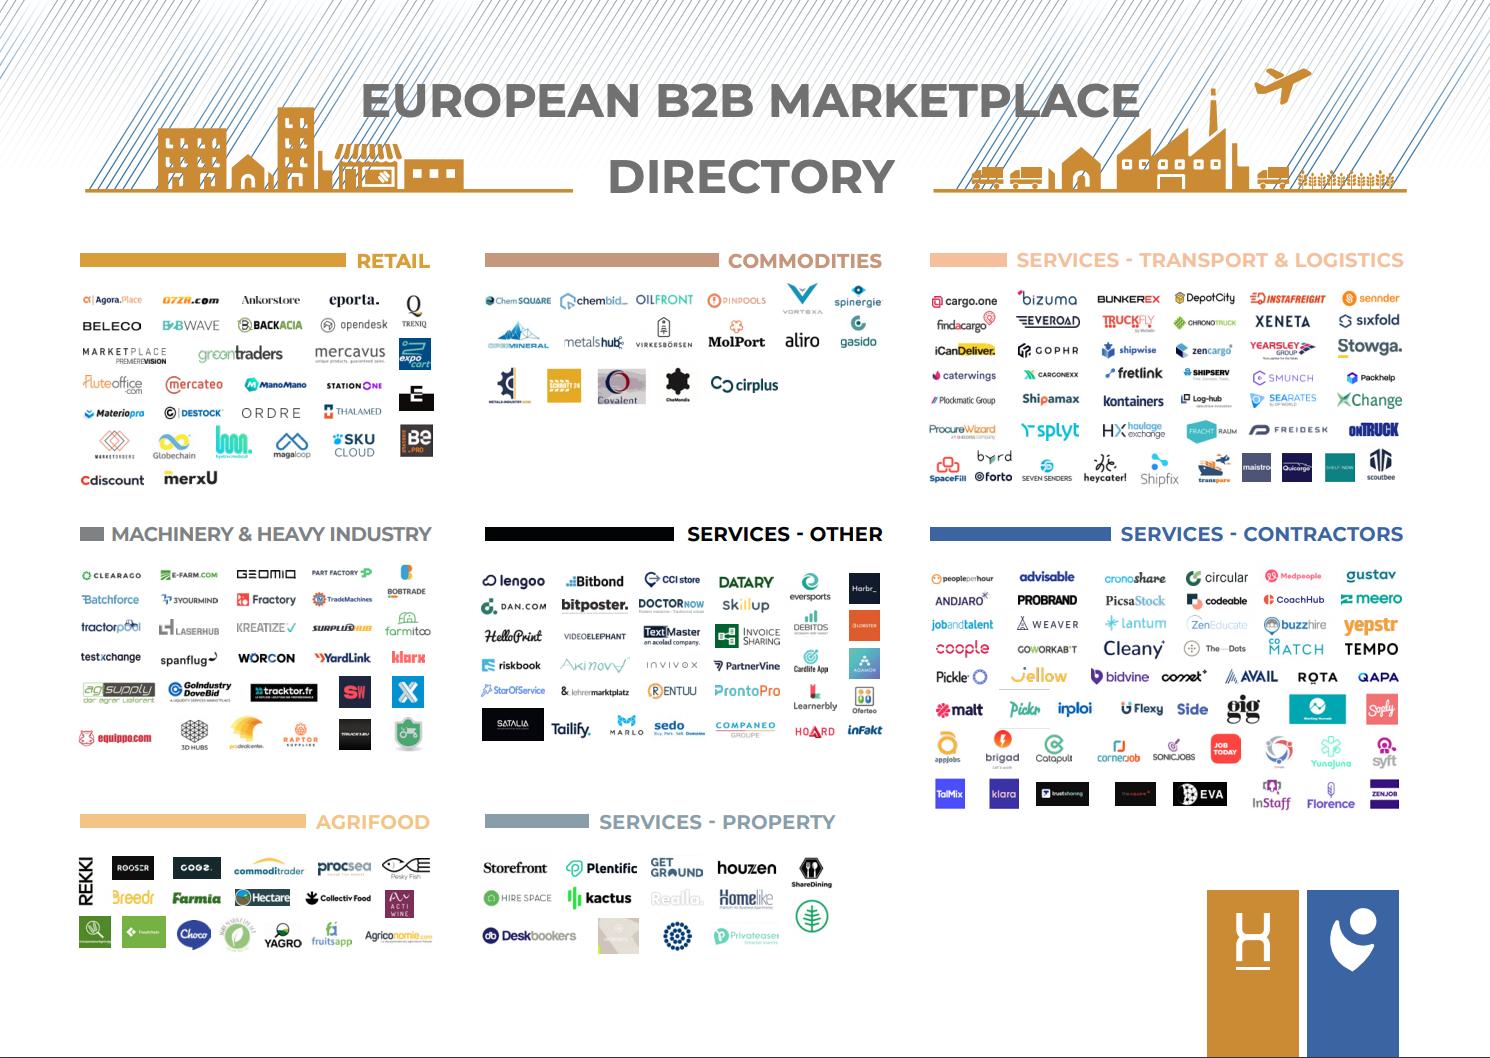 Scaling a B2B Marketplace: Mapping the European B2B Marketplace Landscape